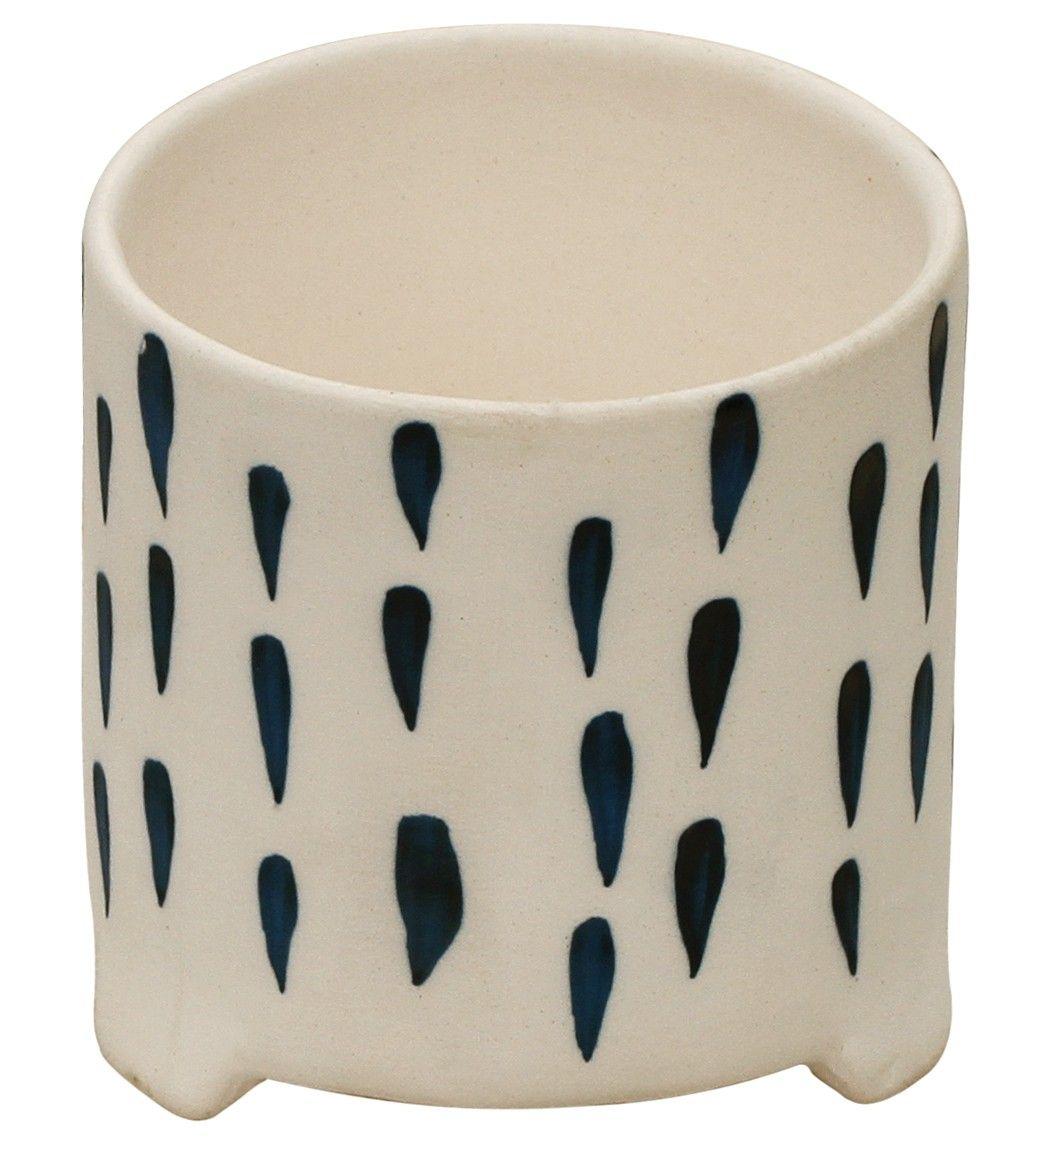 Rain Drops Handmade 4 Ceramic Flower Vase Planter Pot With Blue Strikes On White Elegant Home Decor Wholesale Garden Decor Handmade Ceramics